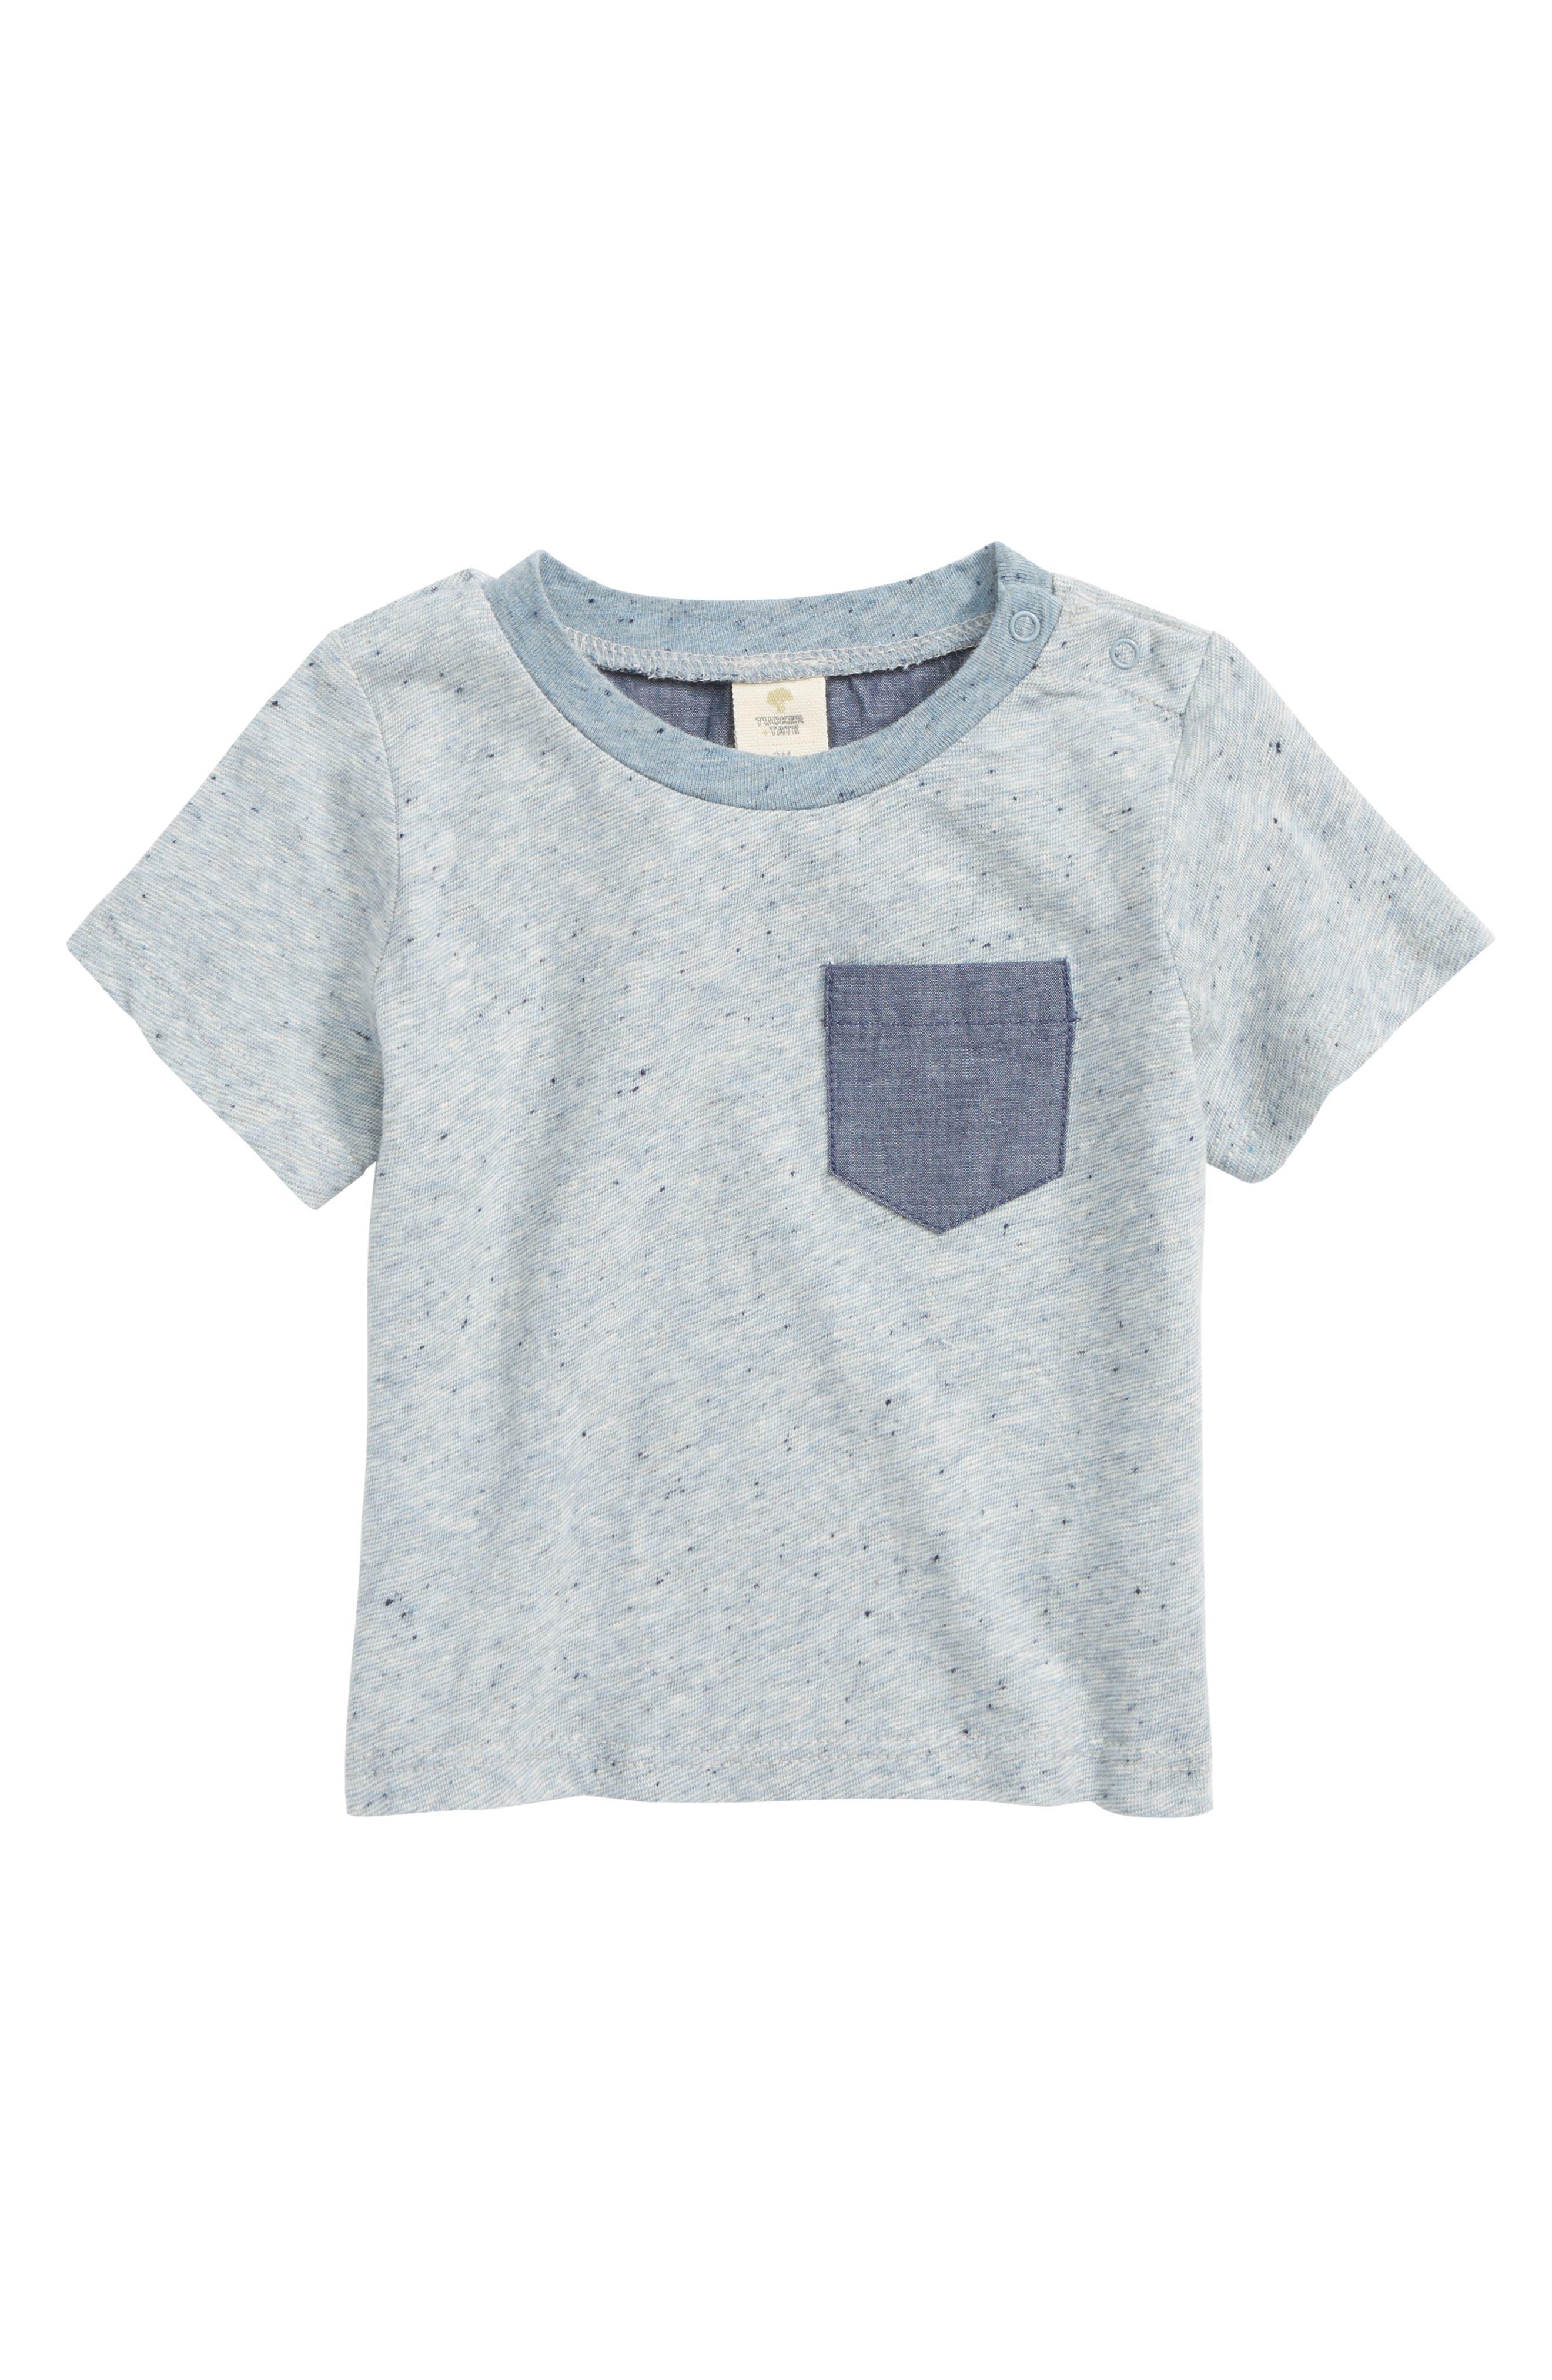 TUCKER + TATE Pocket T-Shirt, Main, color, BLUE DUSK